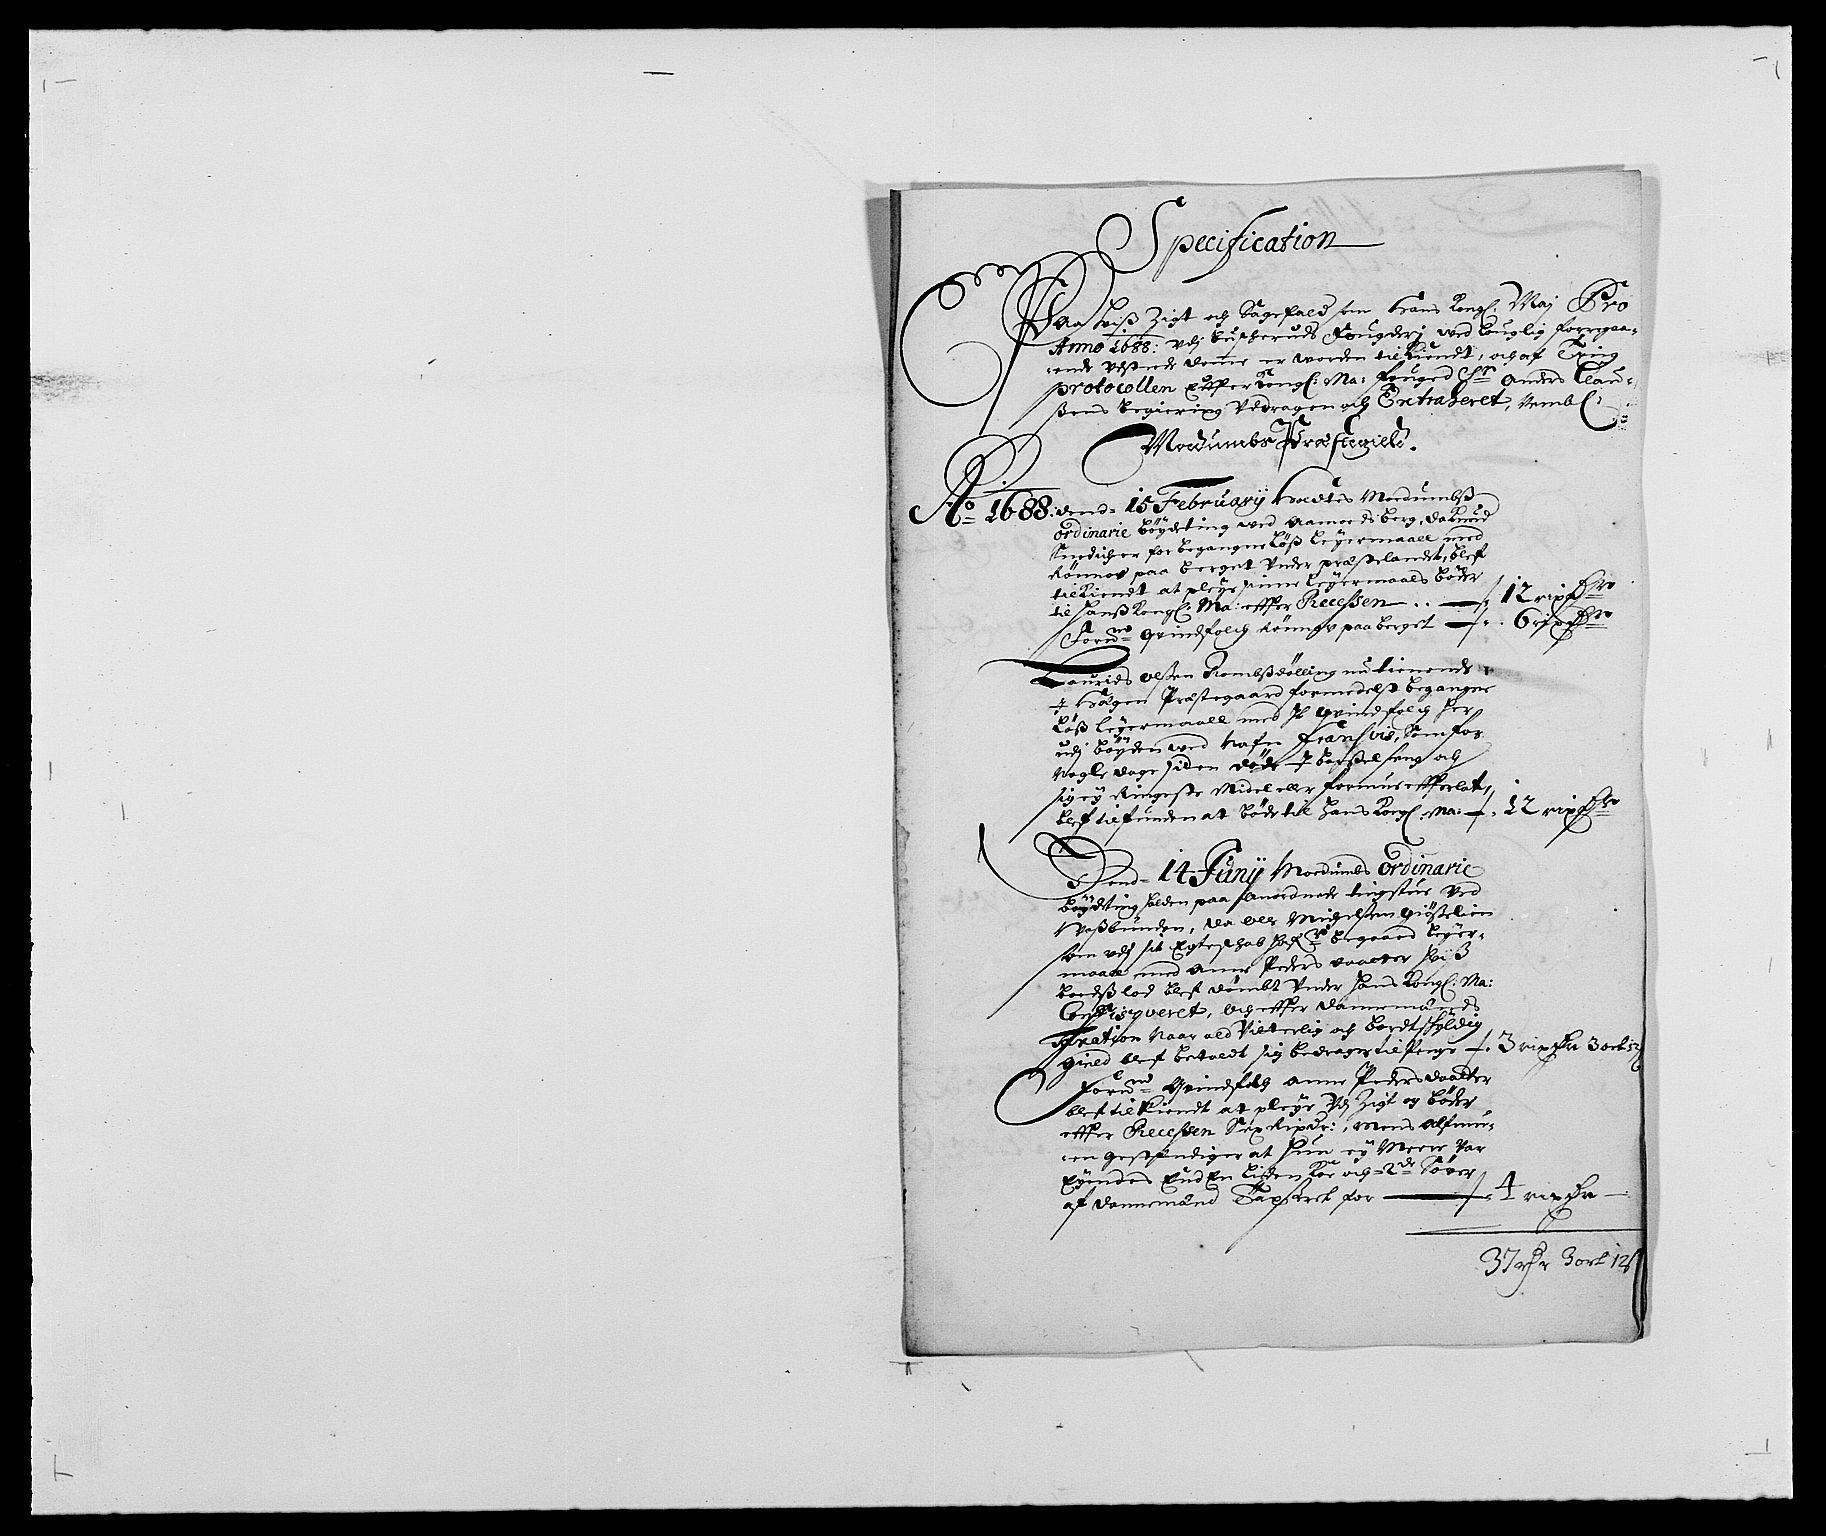 RA, Rentekammeret inntil 1814, Reviderte regnskaper, Fogderegnskap, R25/L1679: Fogderegnskap Buskerud, 1687-1688, s. 286